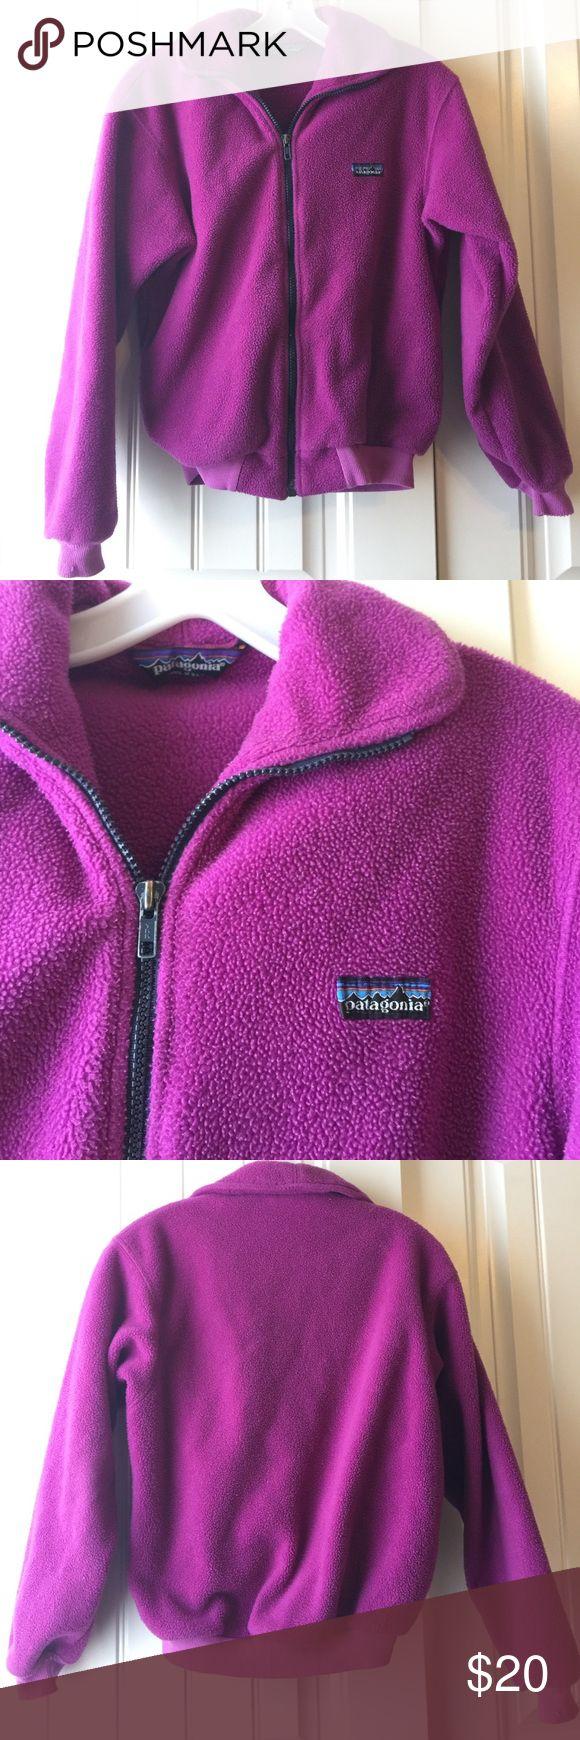 Girls Patagonia Fleece Jacket Size 9/10 Patagonia Jackets & Coats